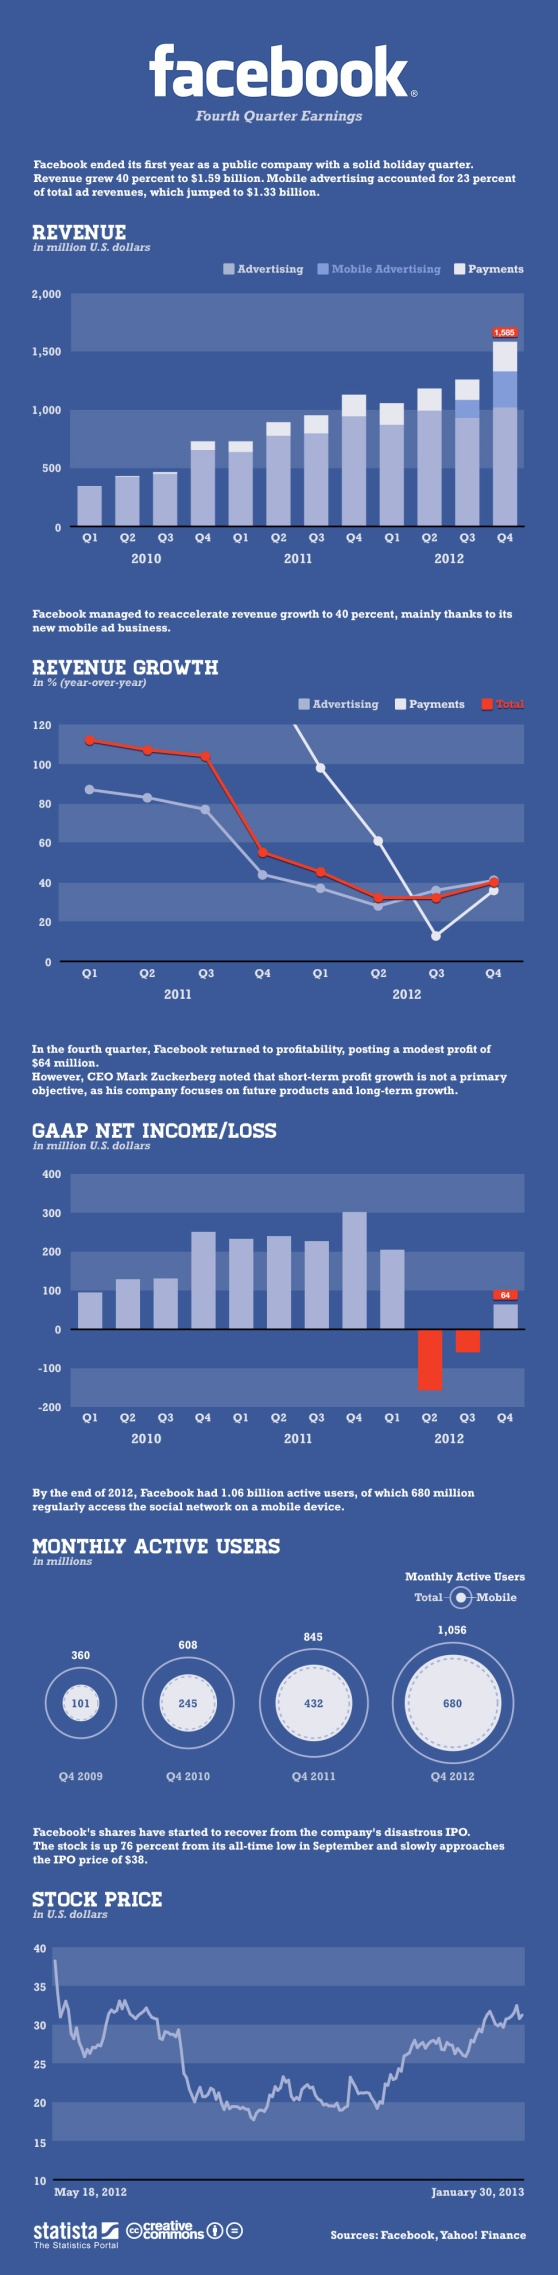 Facebook Fourth Quarter Earnings #infografia #infographic #socialmedia